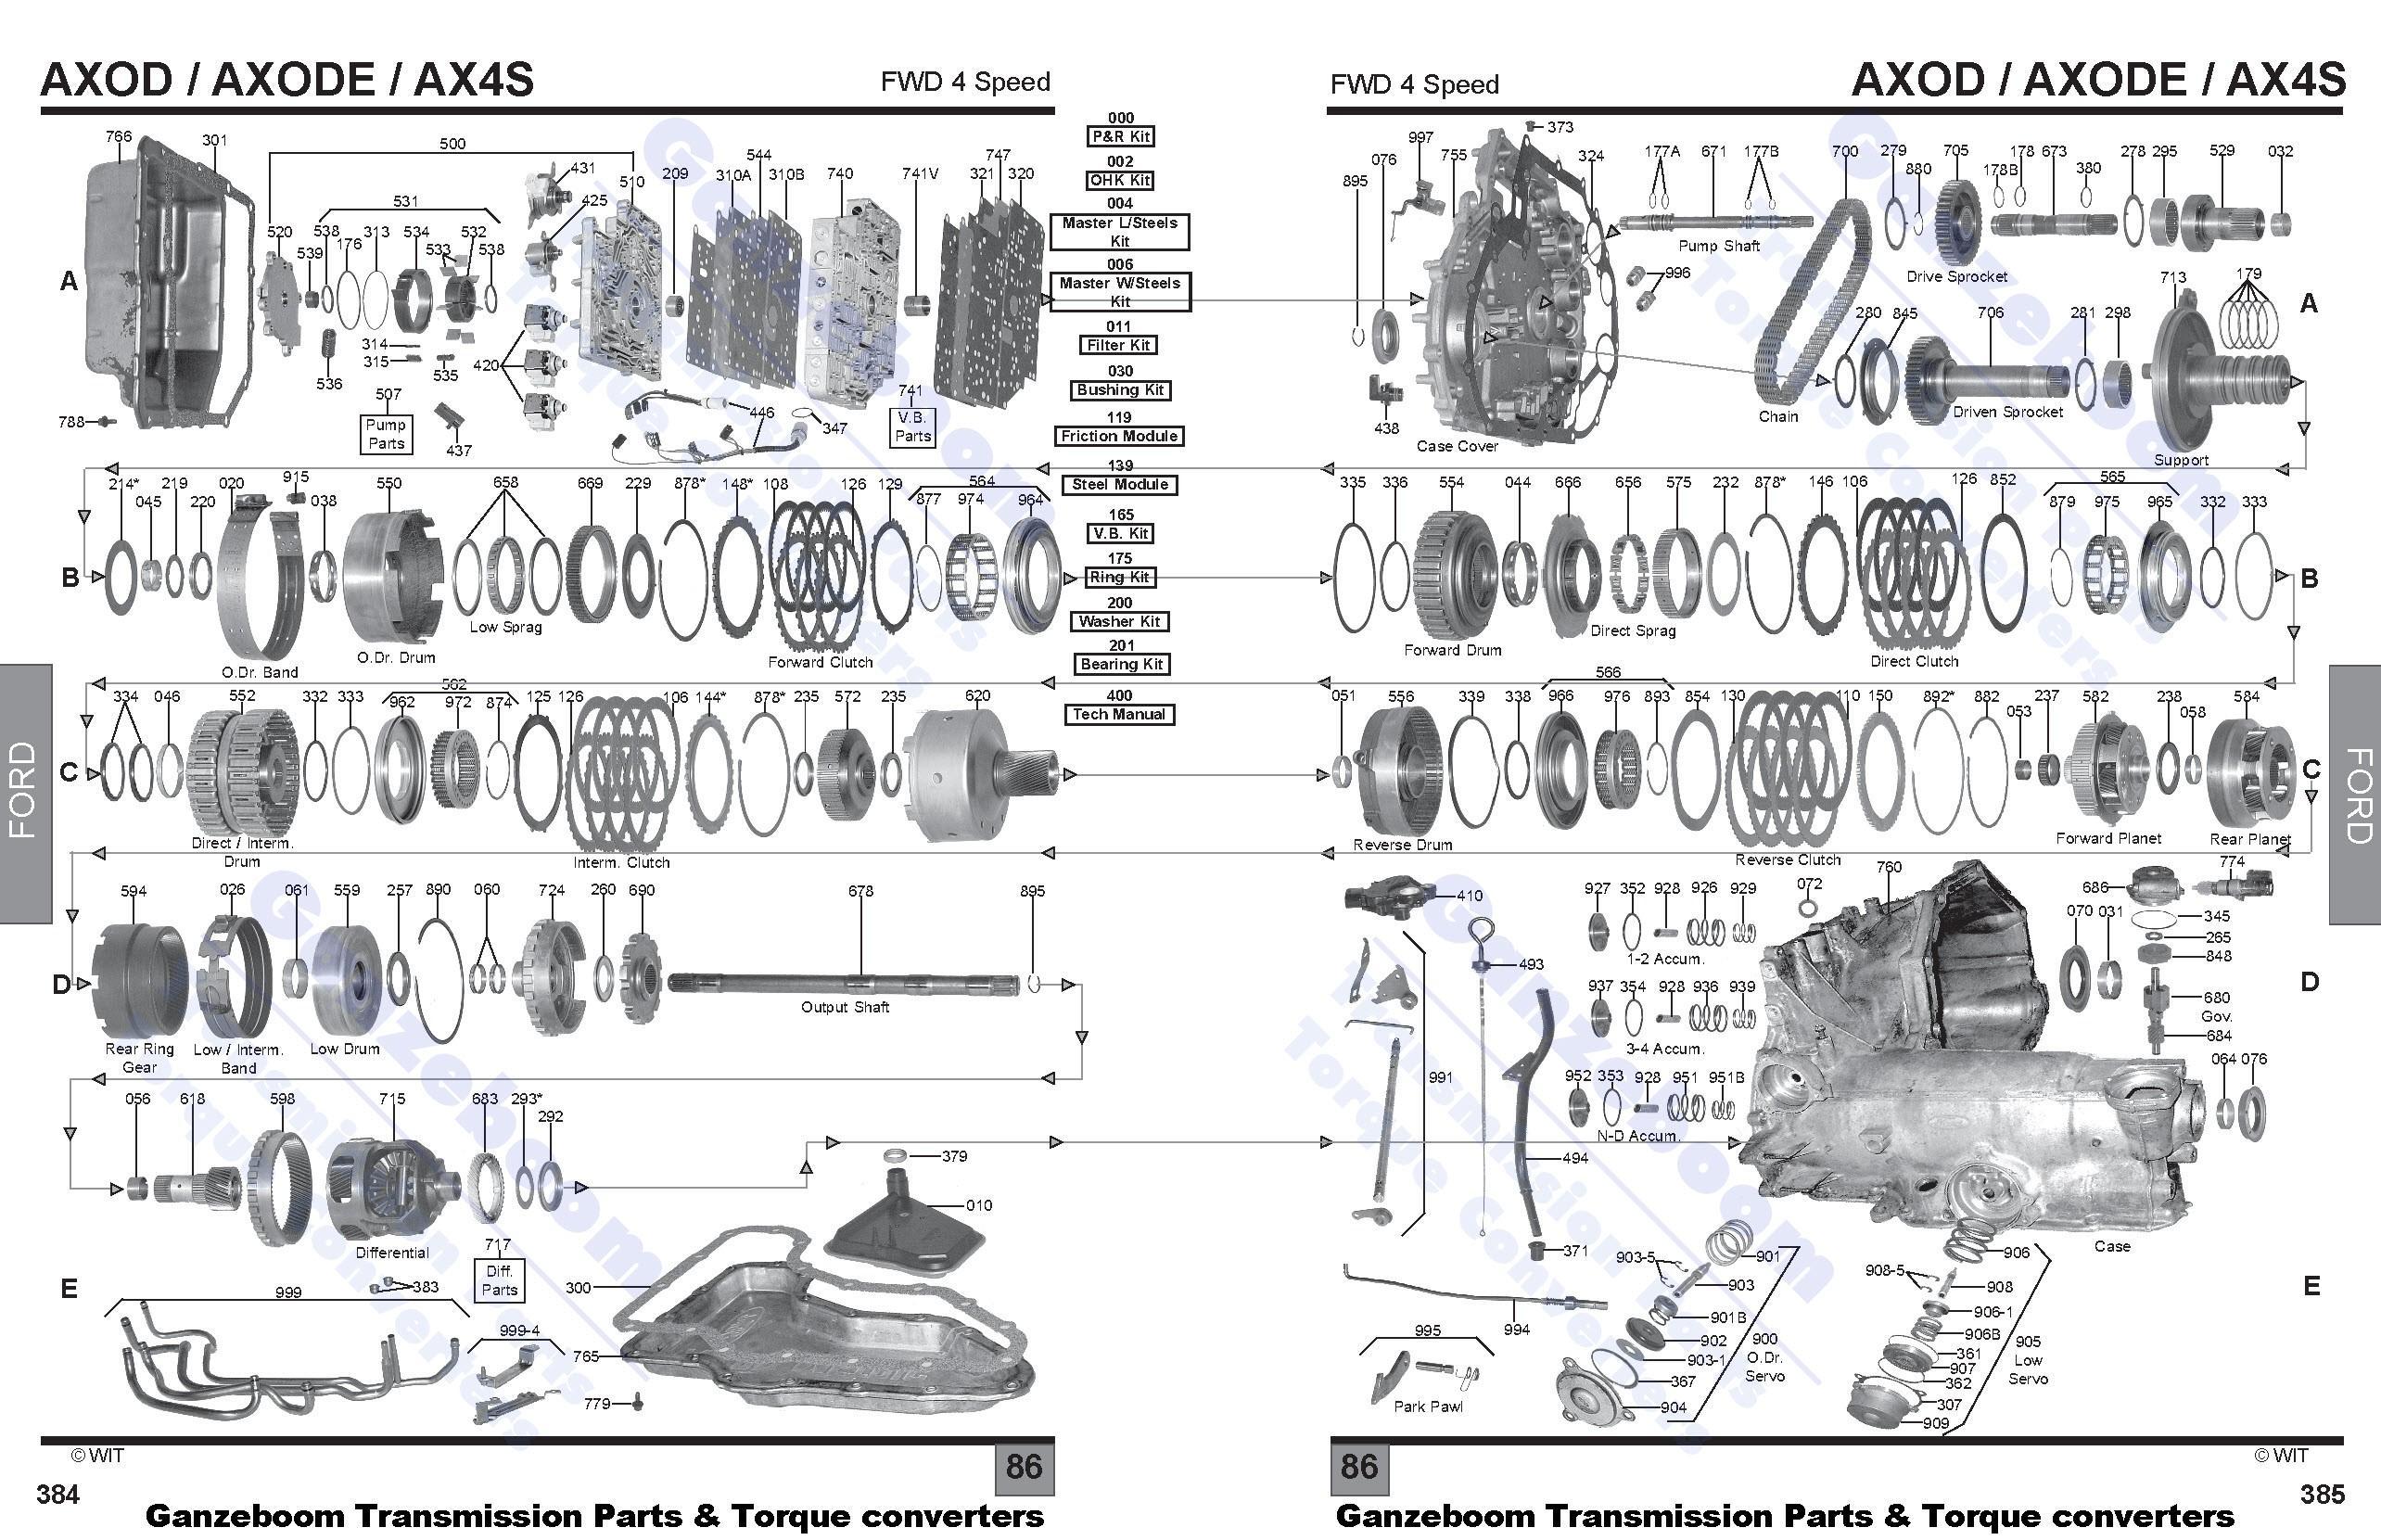 axod-axode-ax4s.jpg